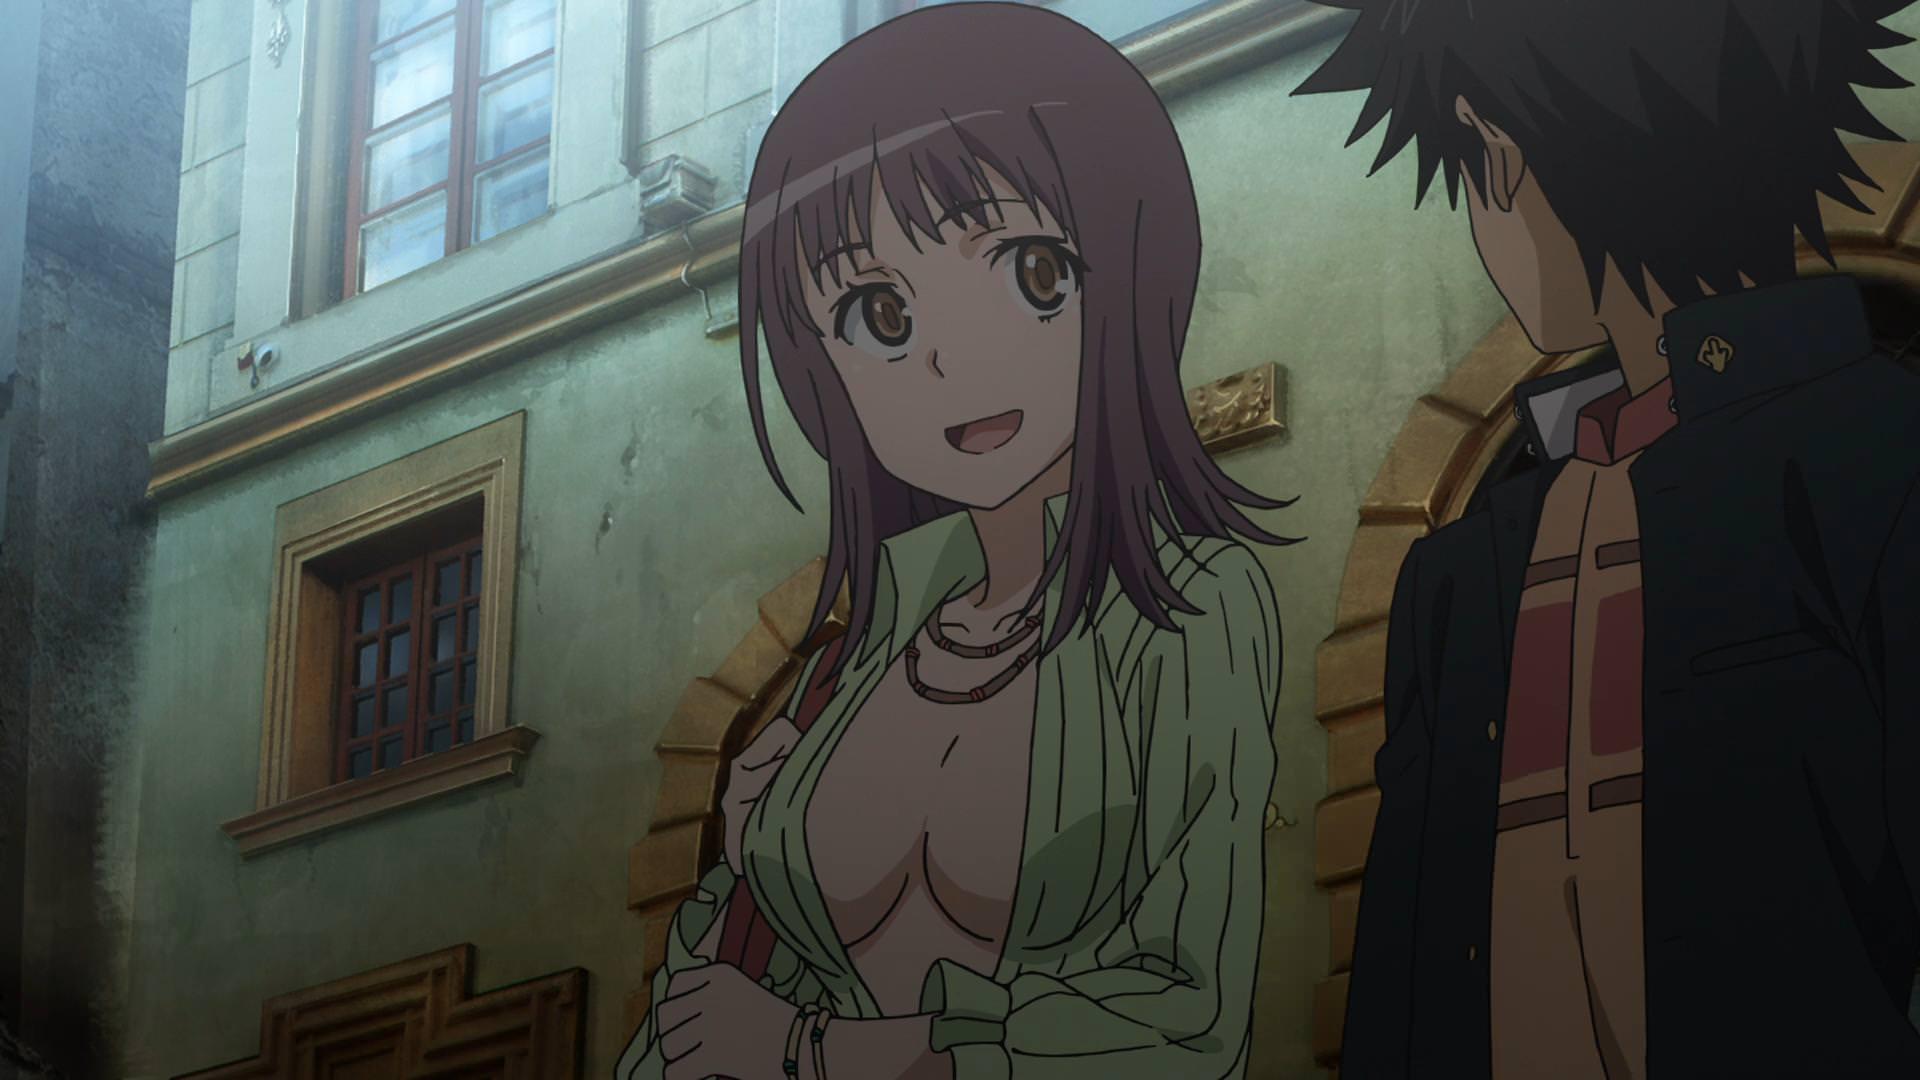 Toaru Majutsu no Index III Episode 2 Discussion - Forums